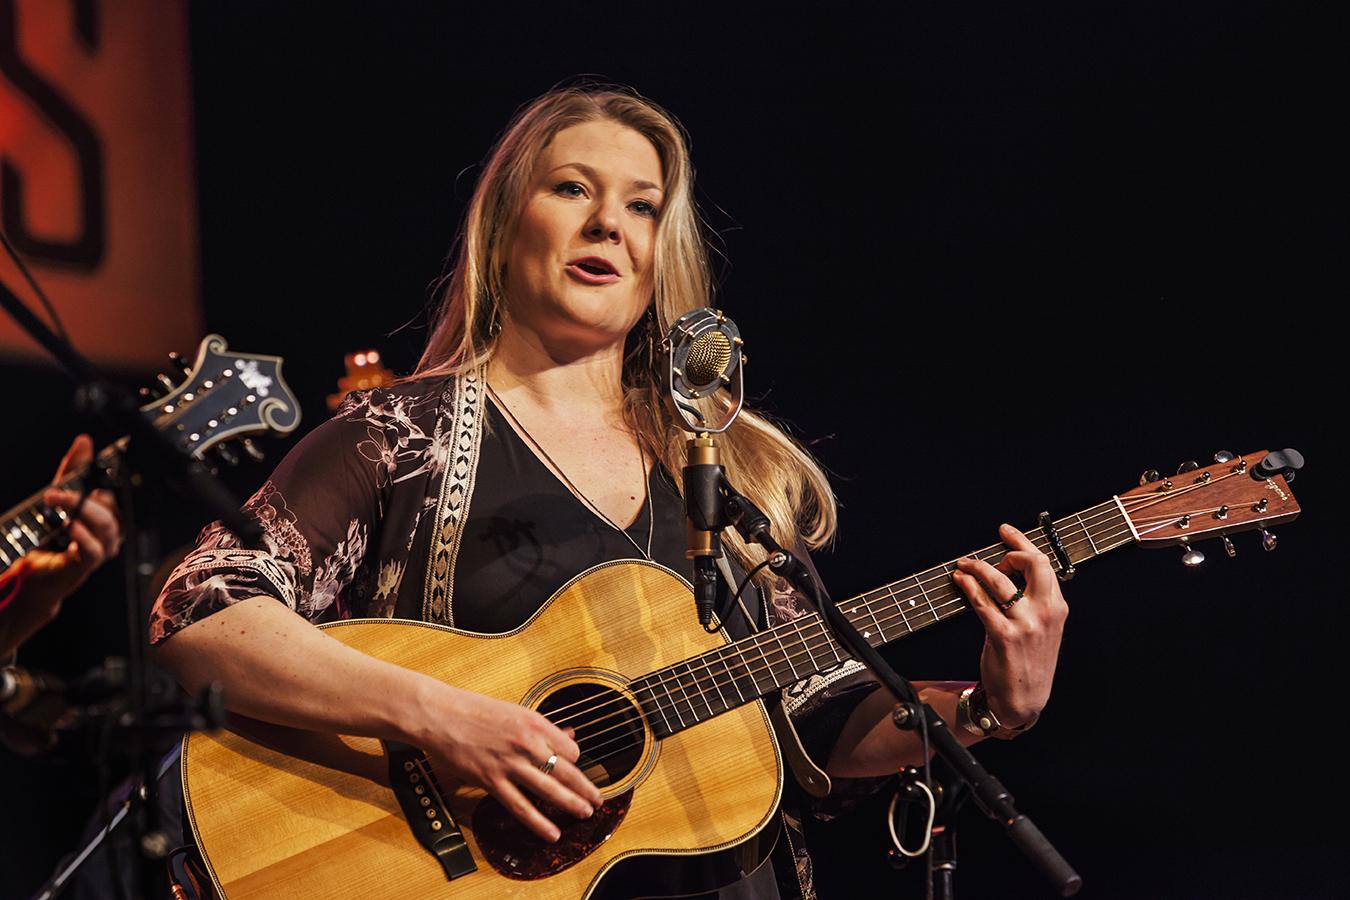 Celia Woodsmith, lead singer for della mae.